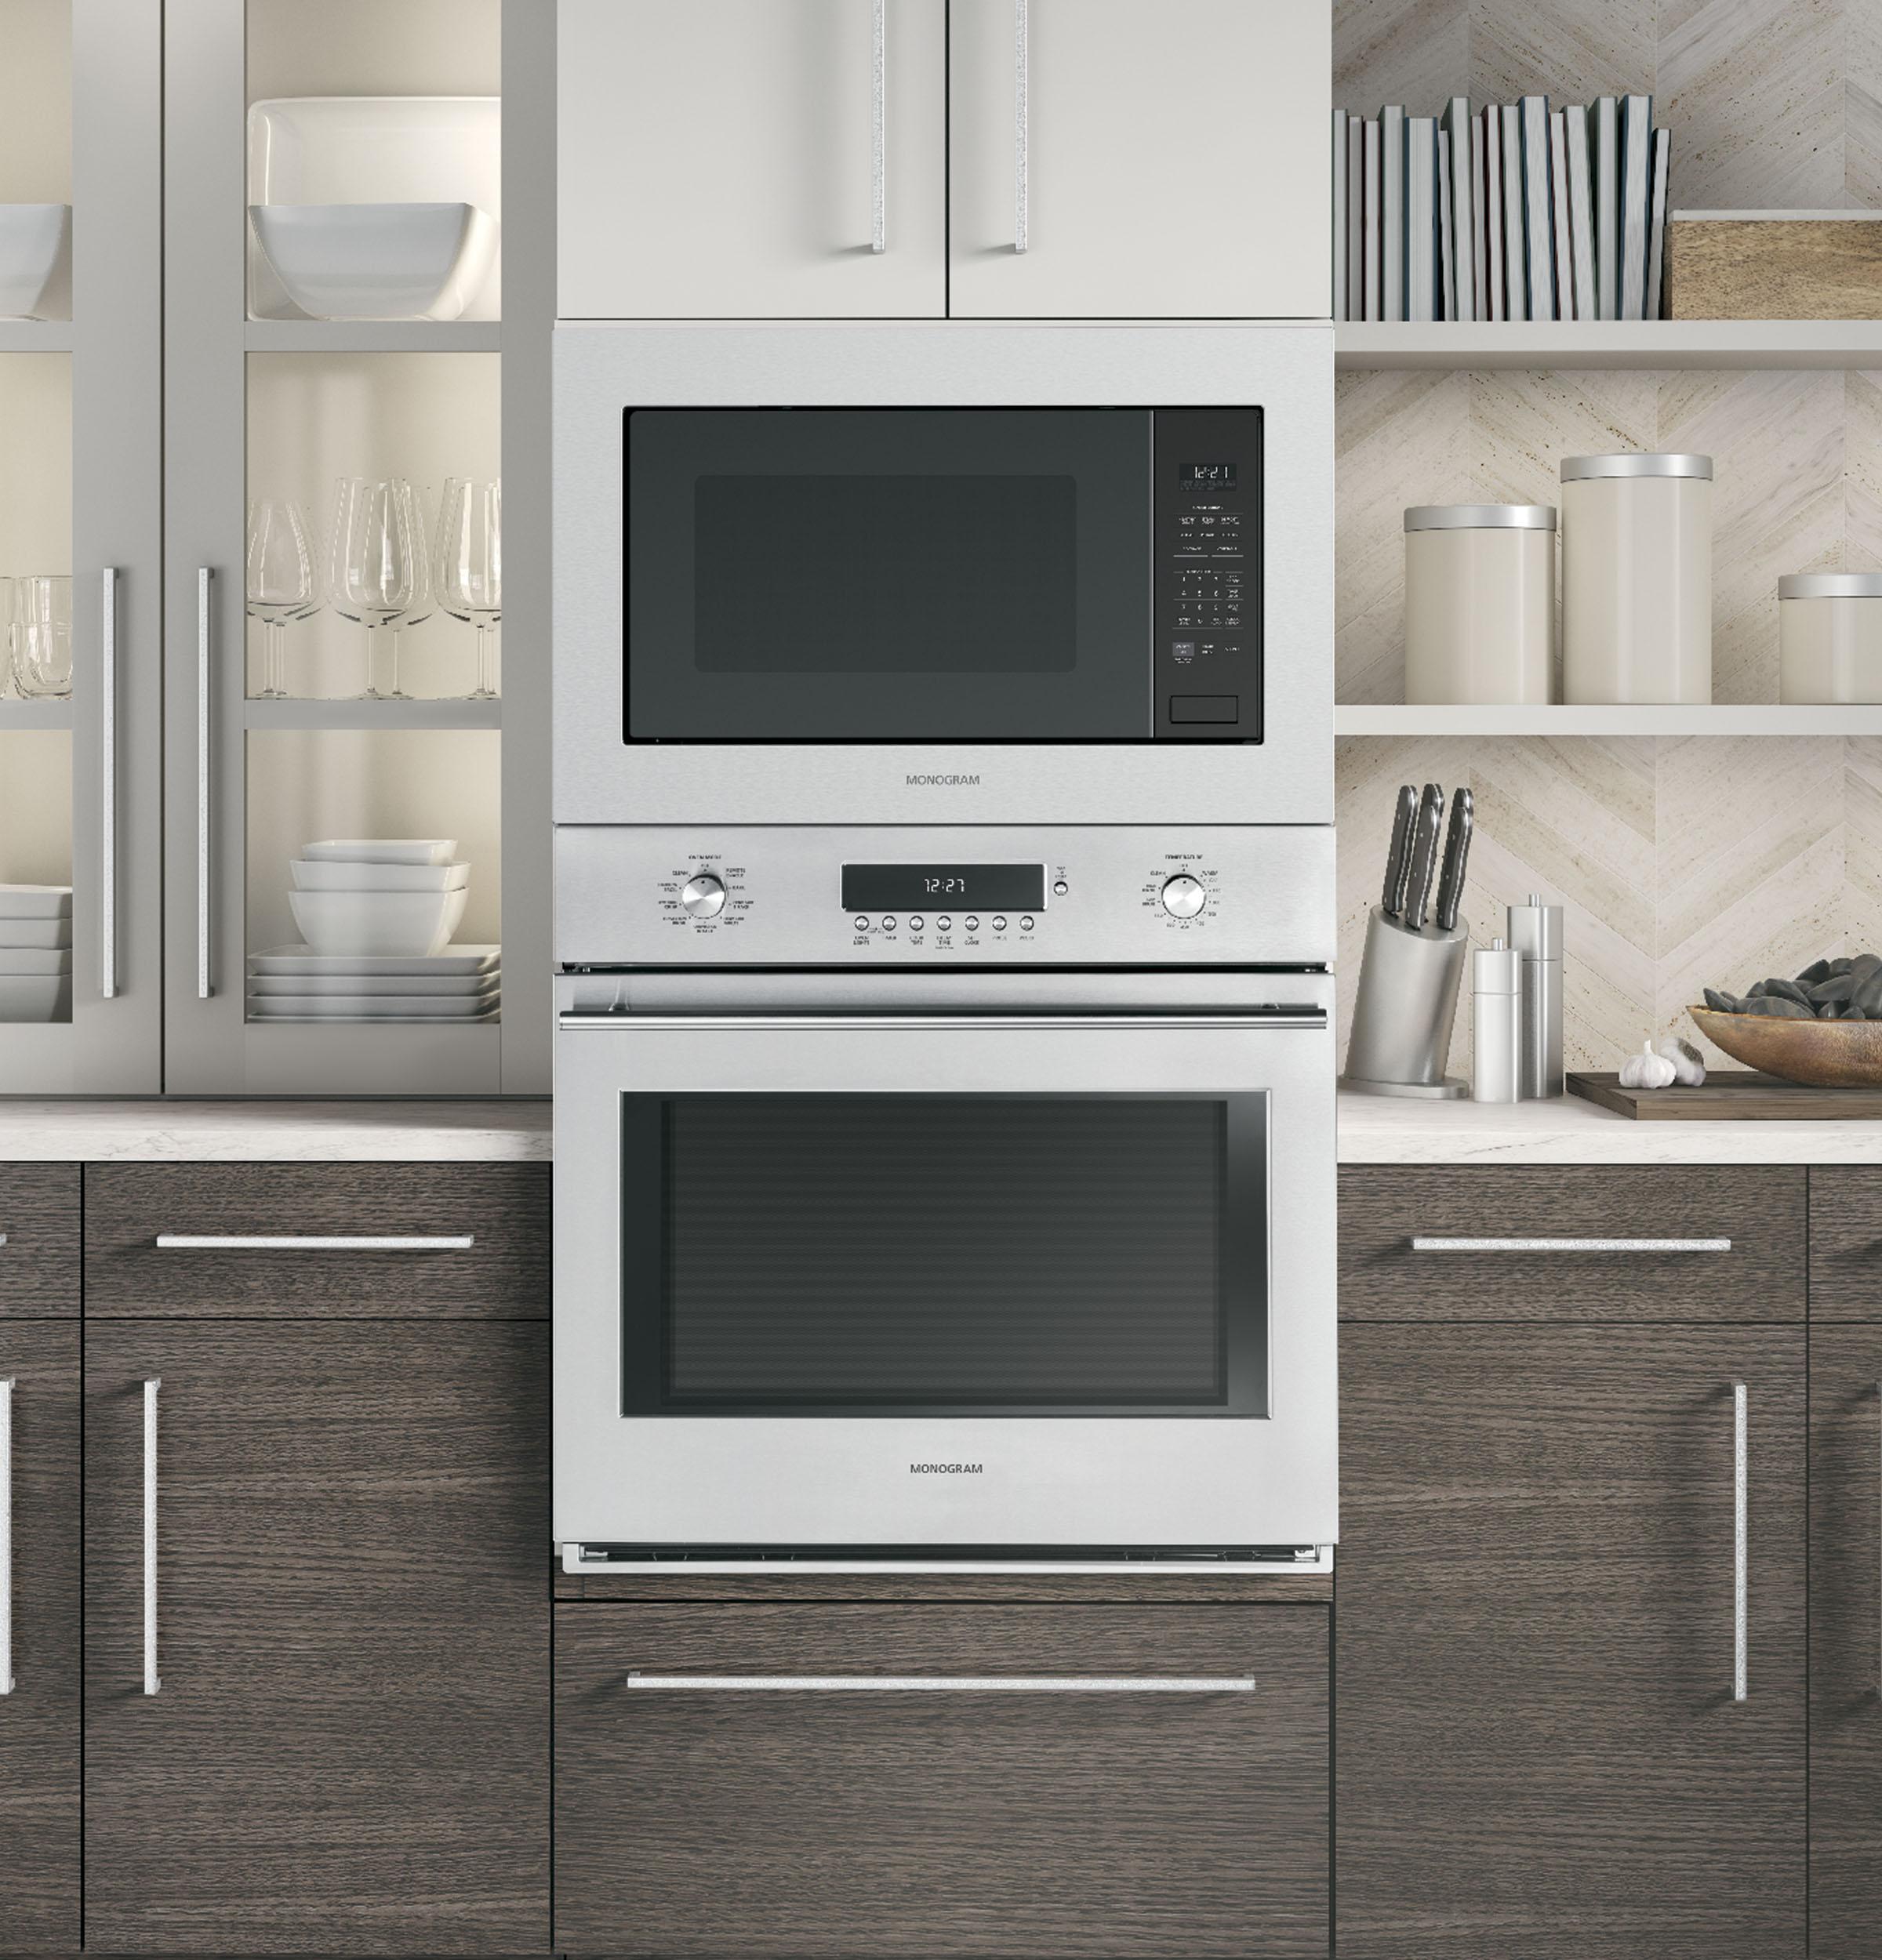 Monogram 2 Cu Ft Built In Microwave Oven